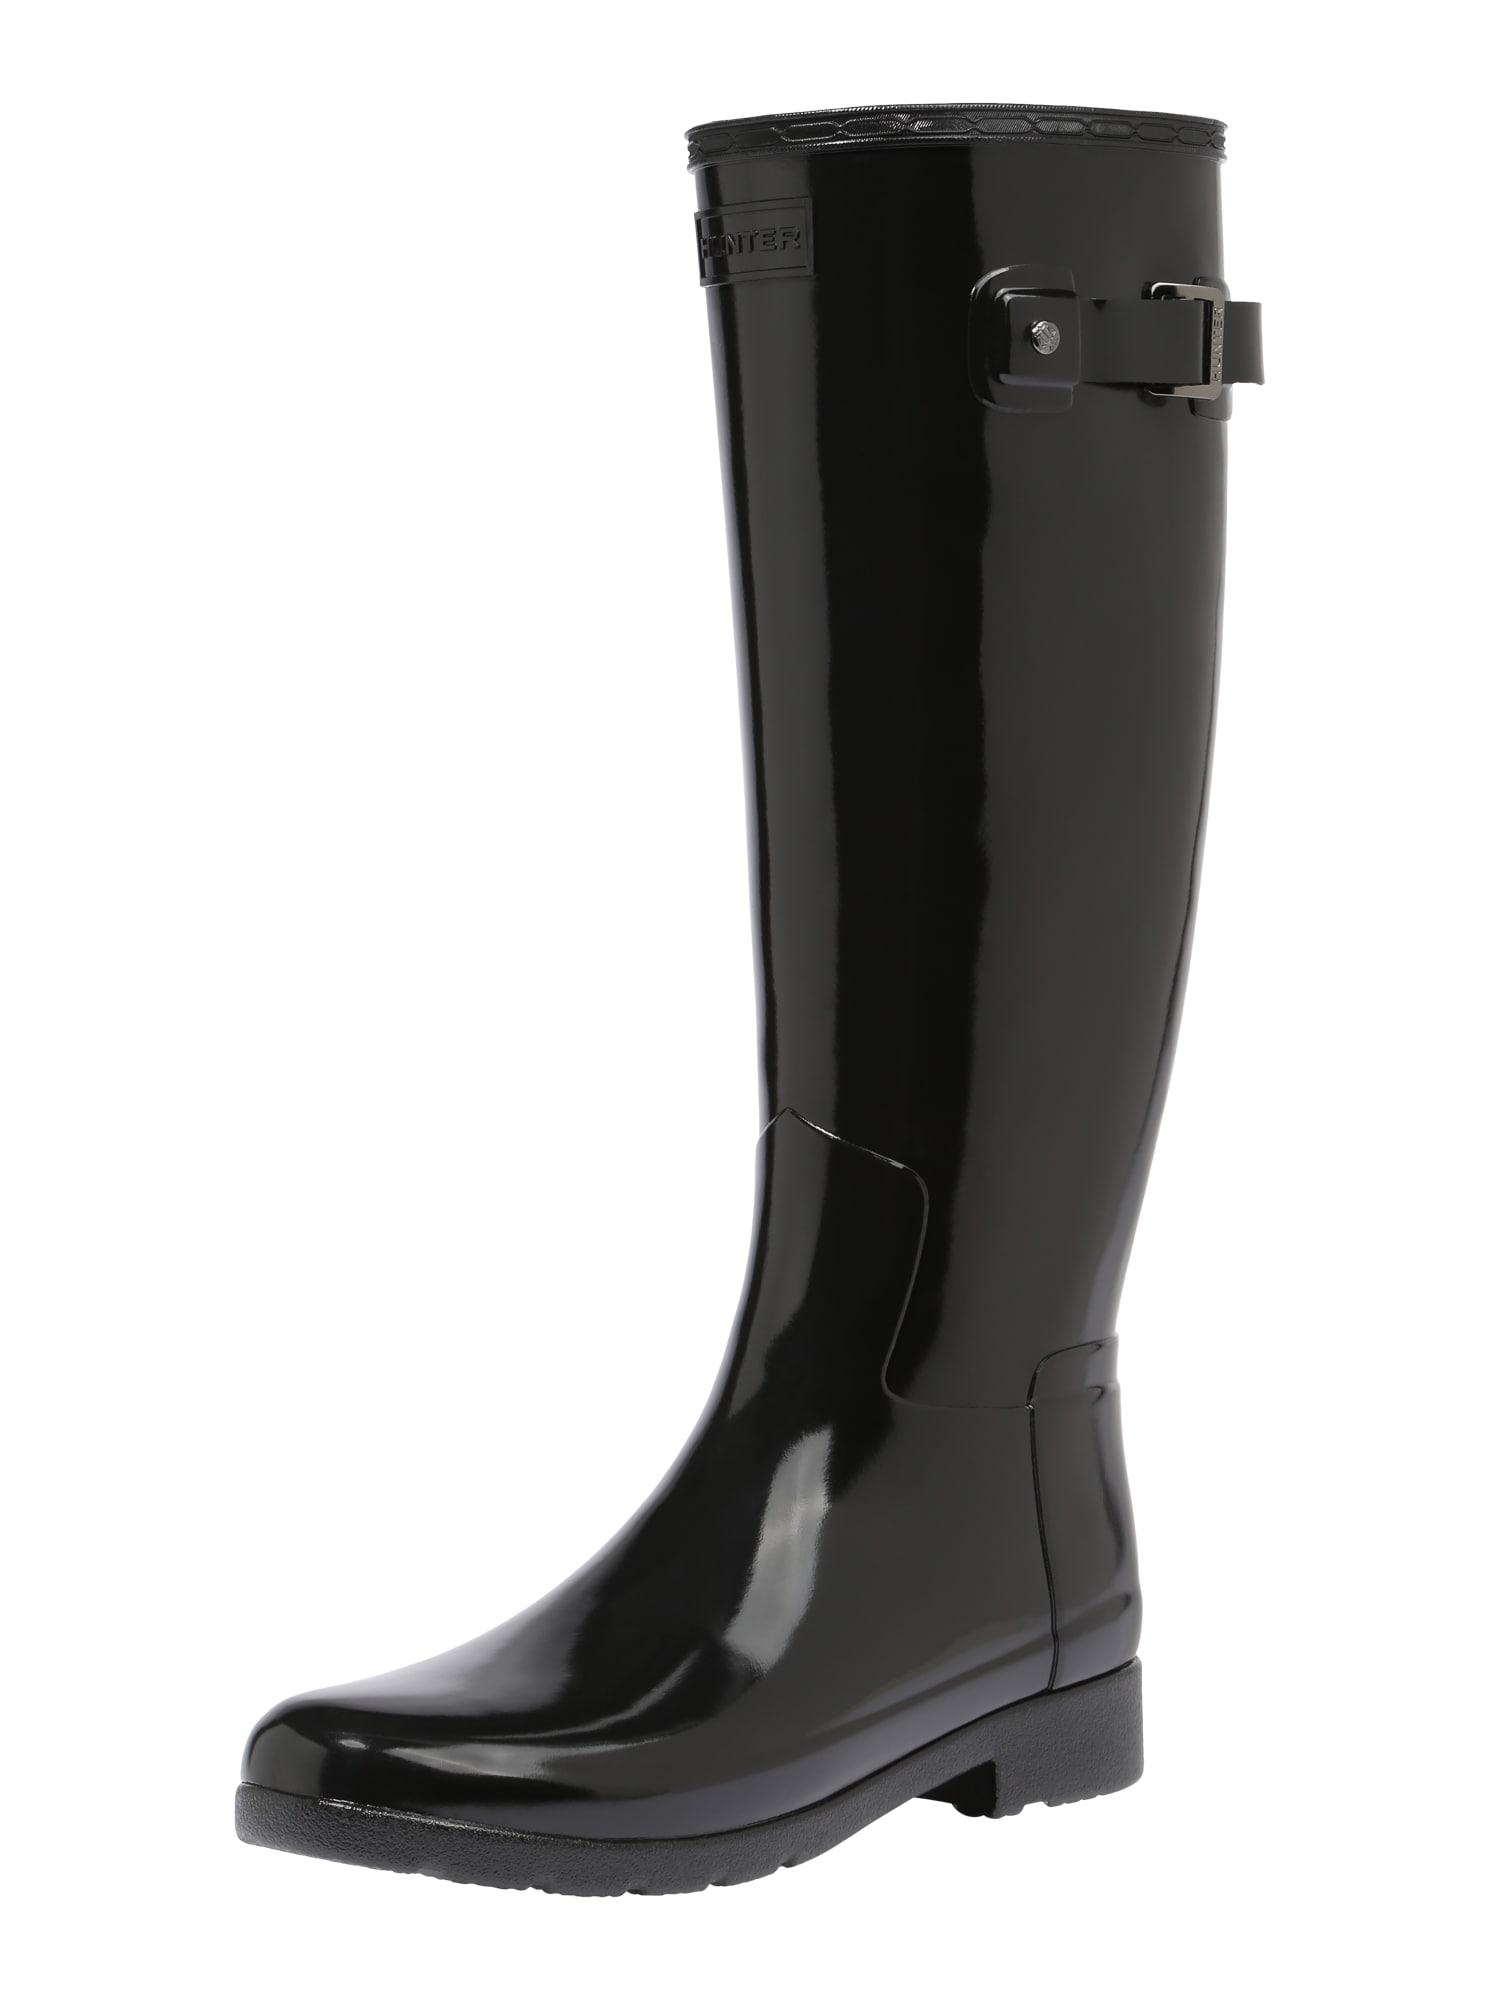 HUNTER Guminiai batai 'ORIGINAL REFINED GLOSS' juoda